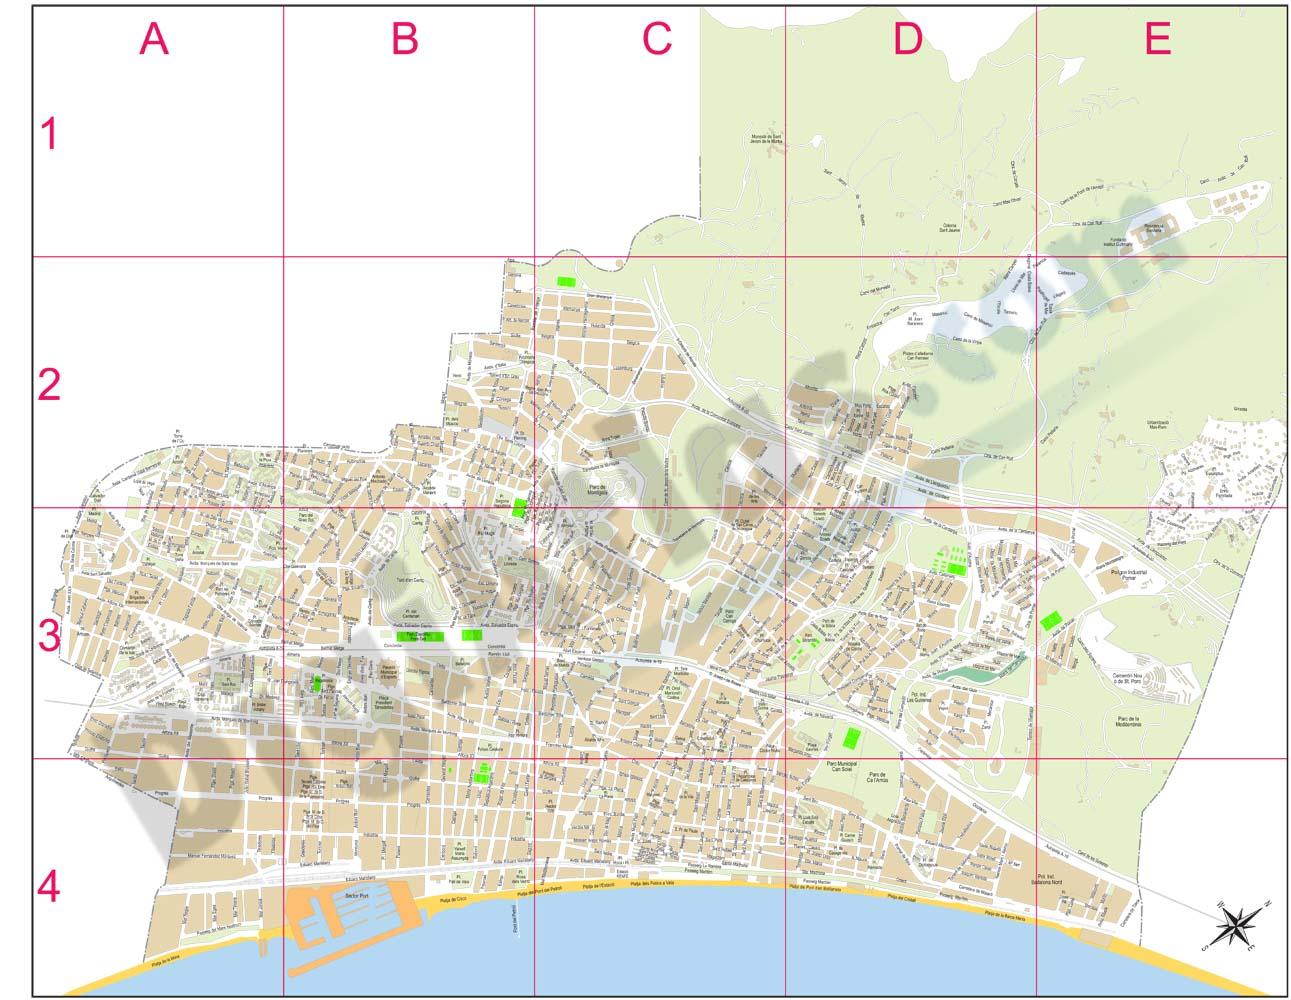 Badalona (Barcelona, Spain) - city map